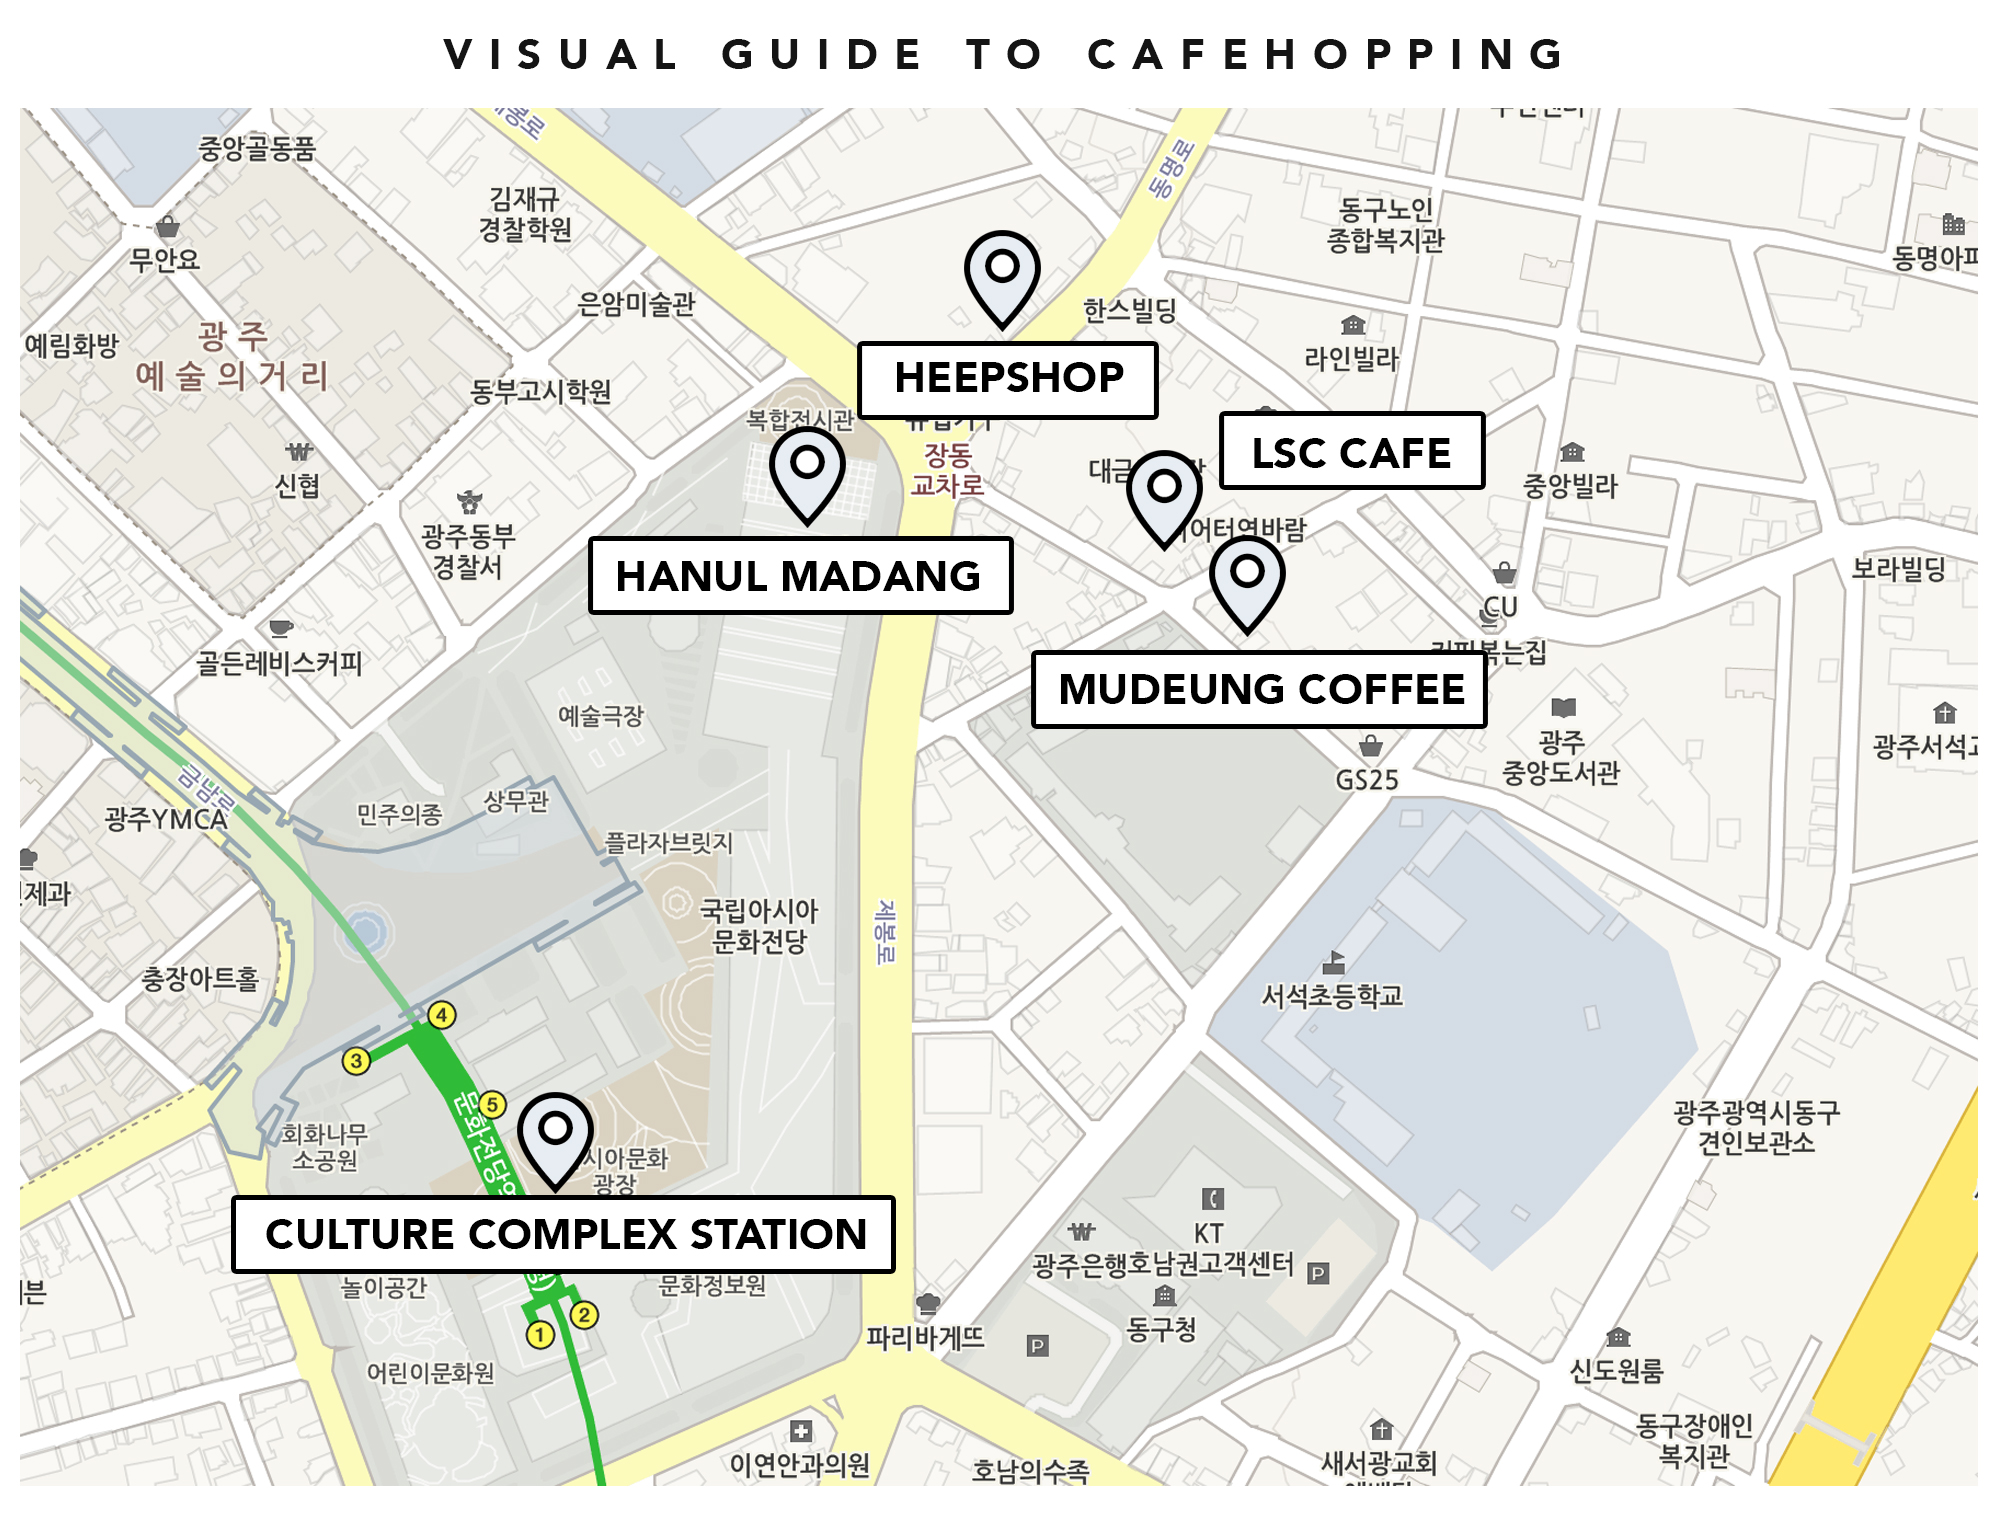 Gwangju Dongmyeongdong cafehopping blog photos